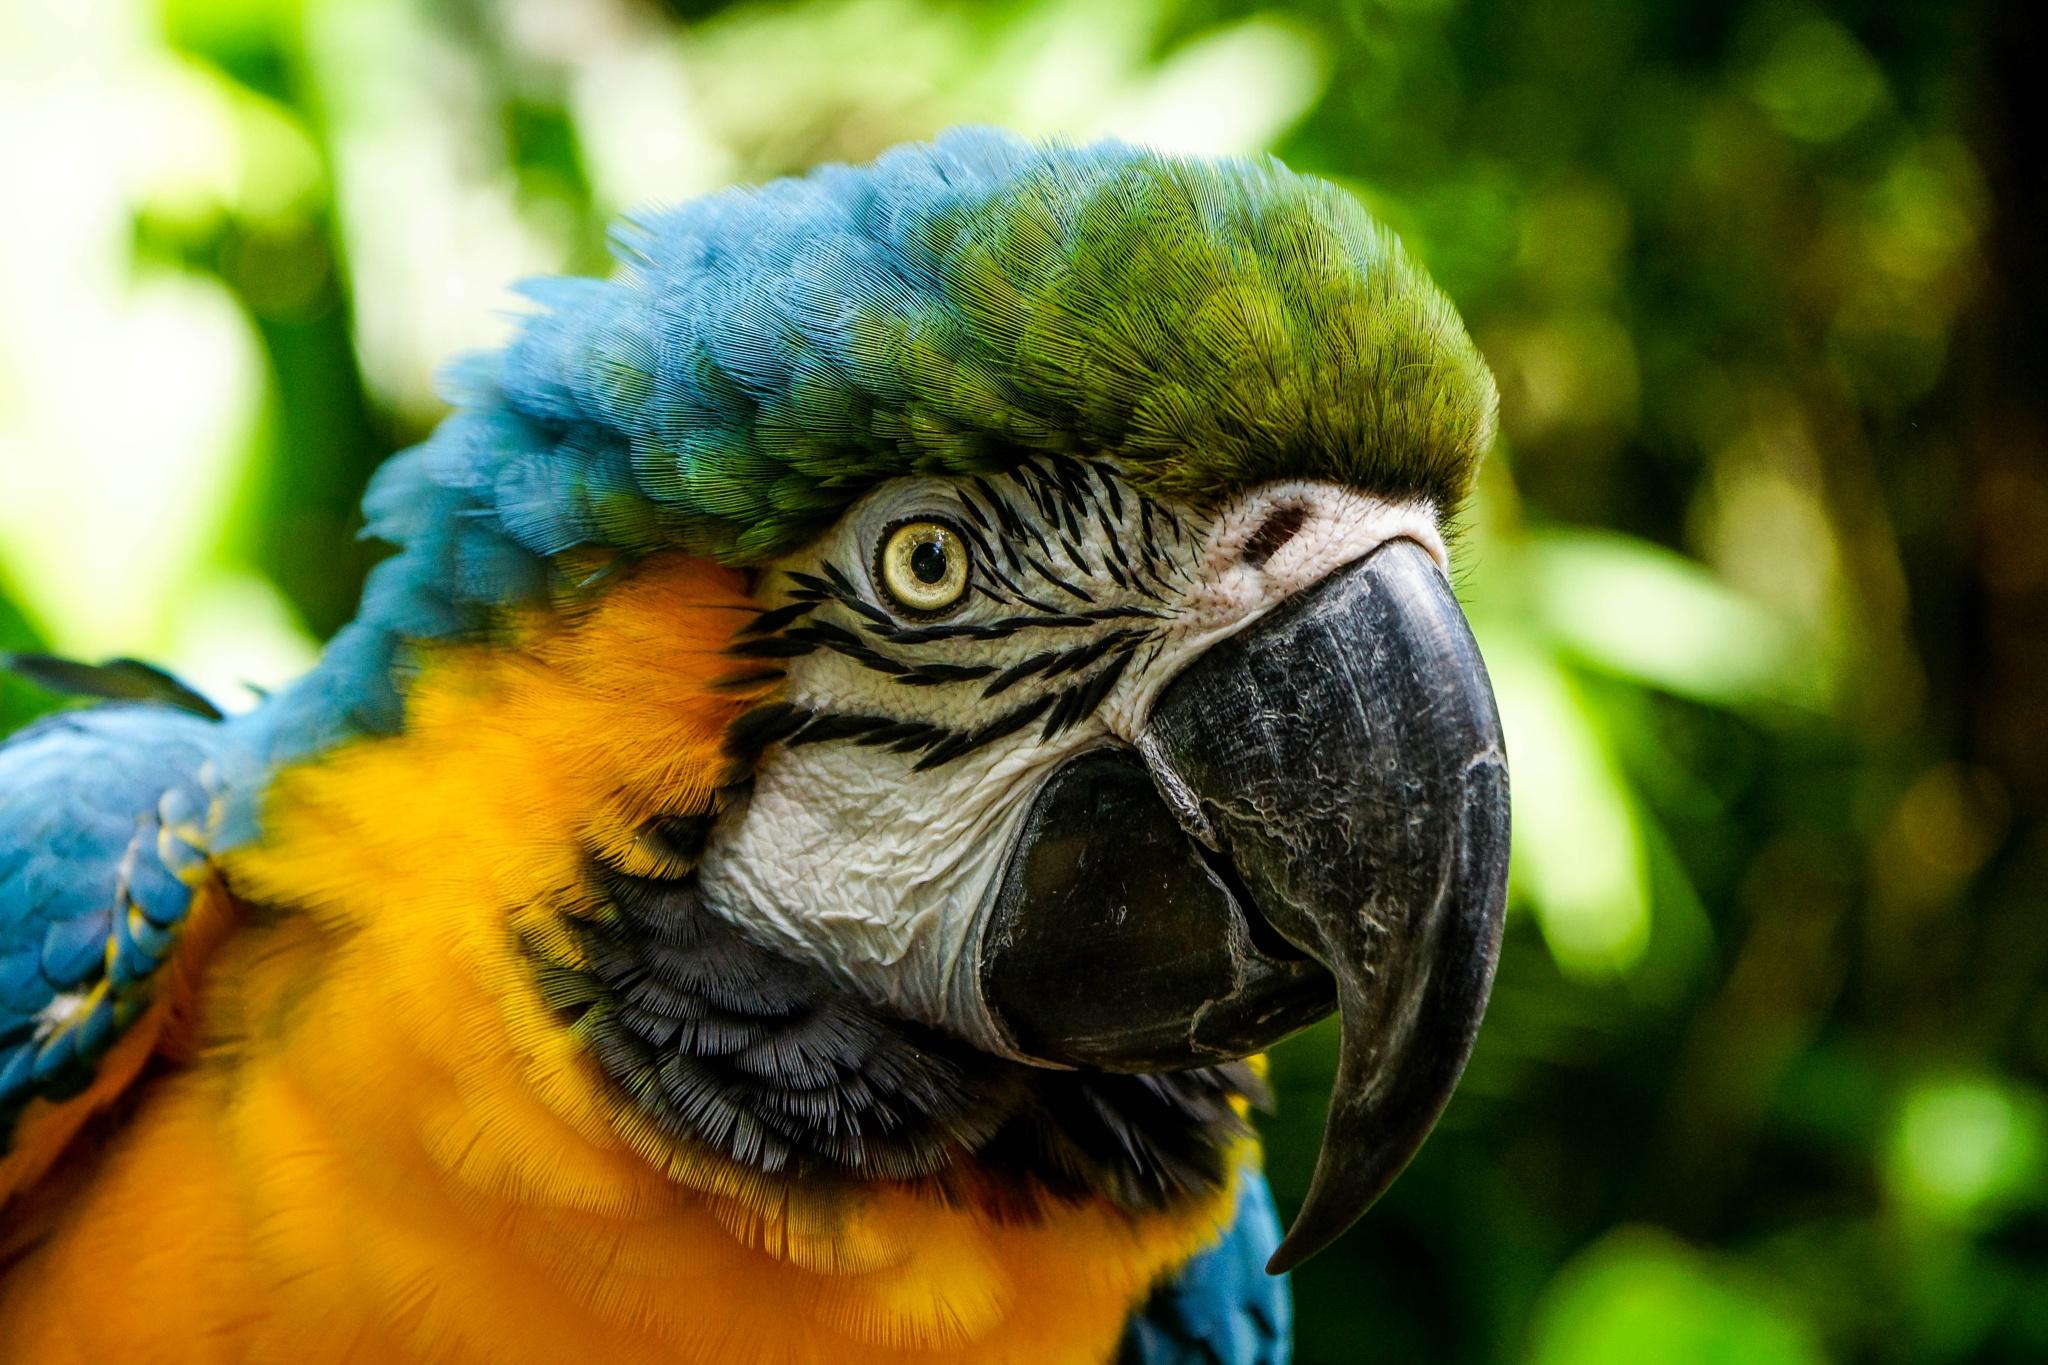 Macaw Parrot by Andrew Oostenbroek